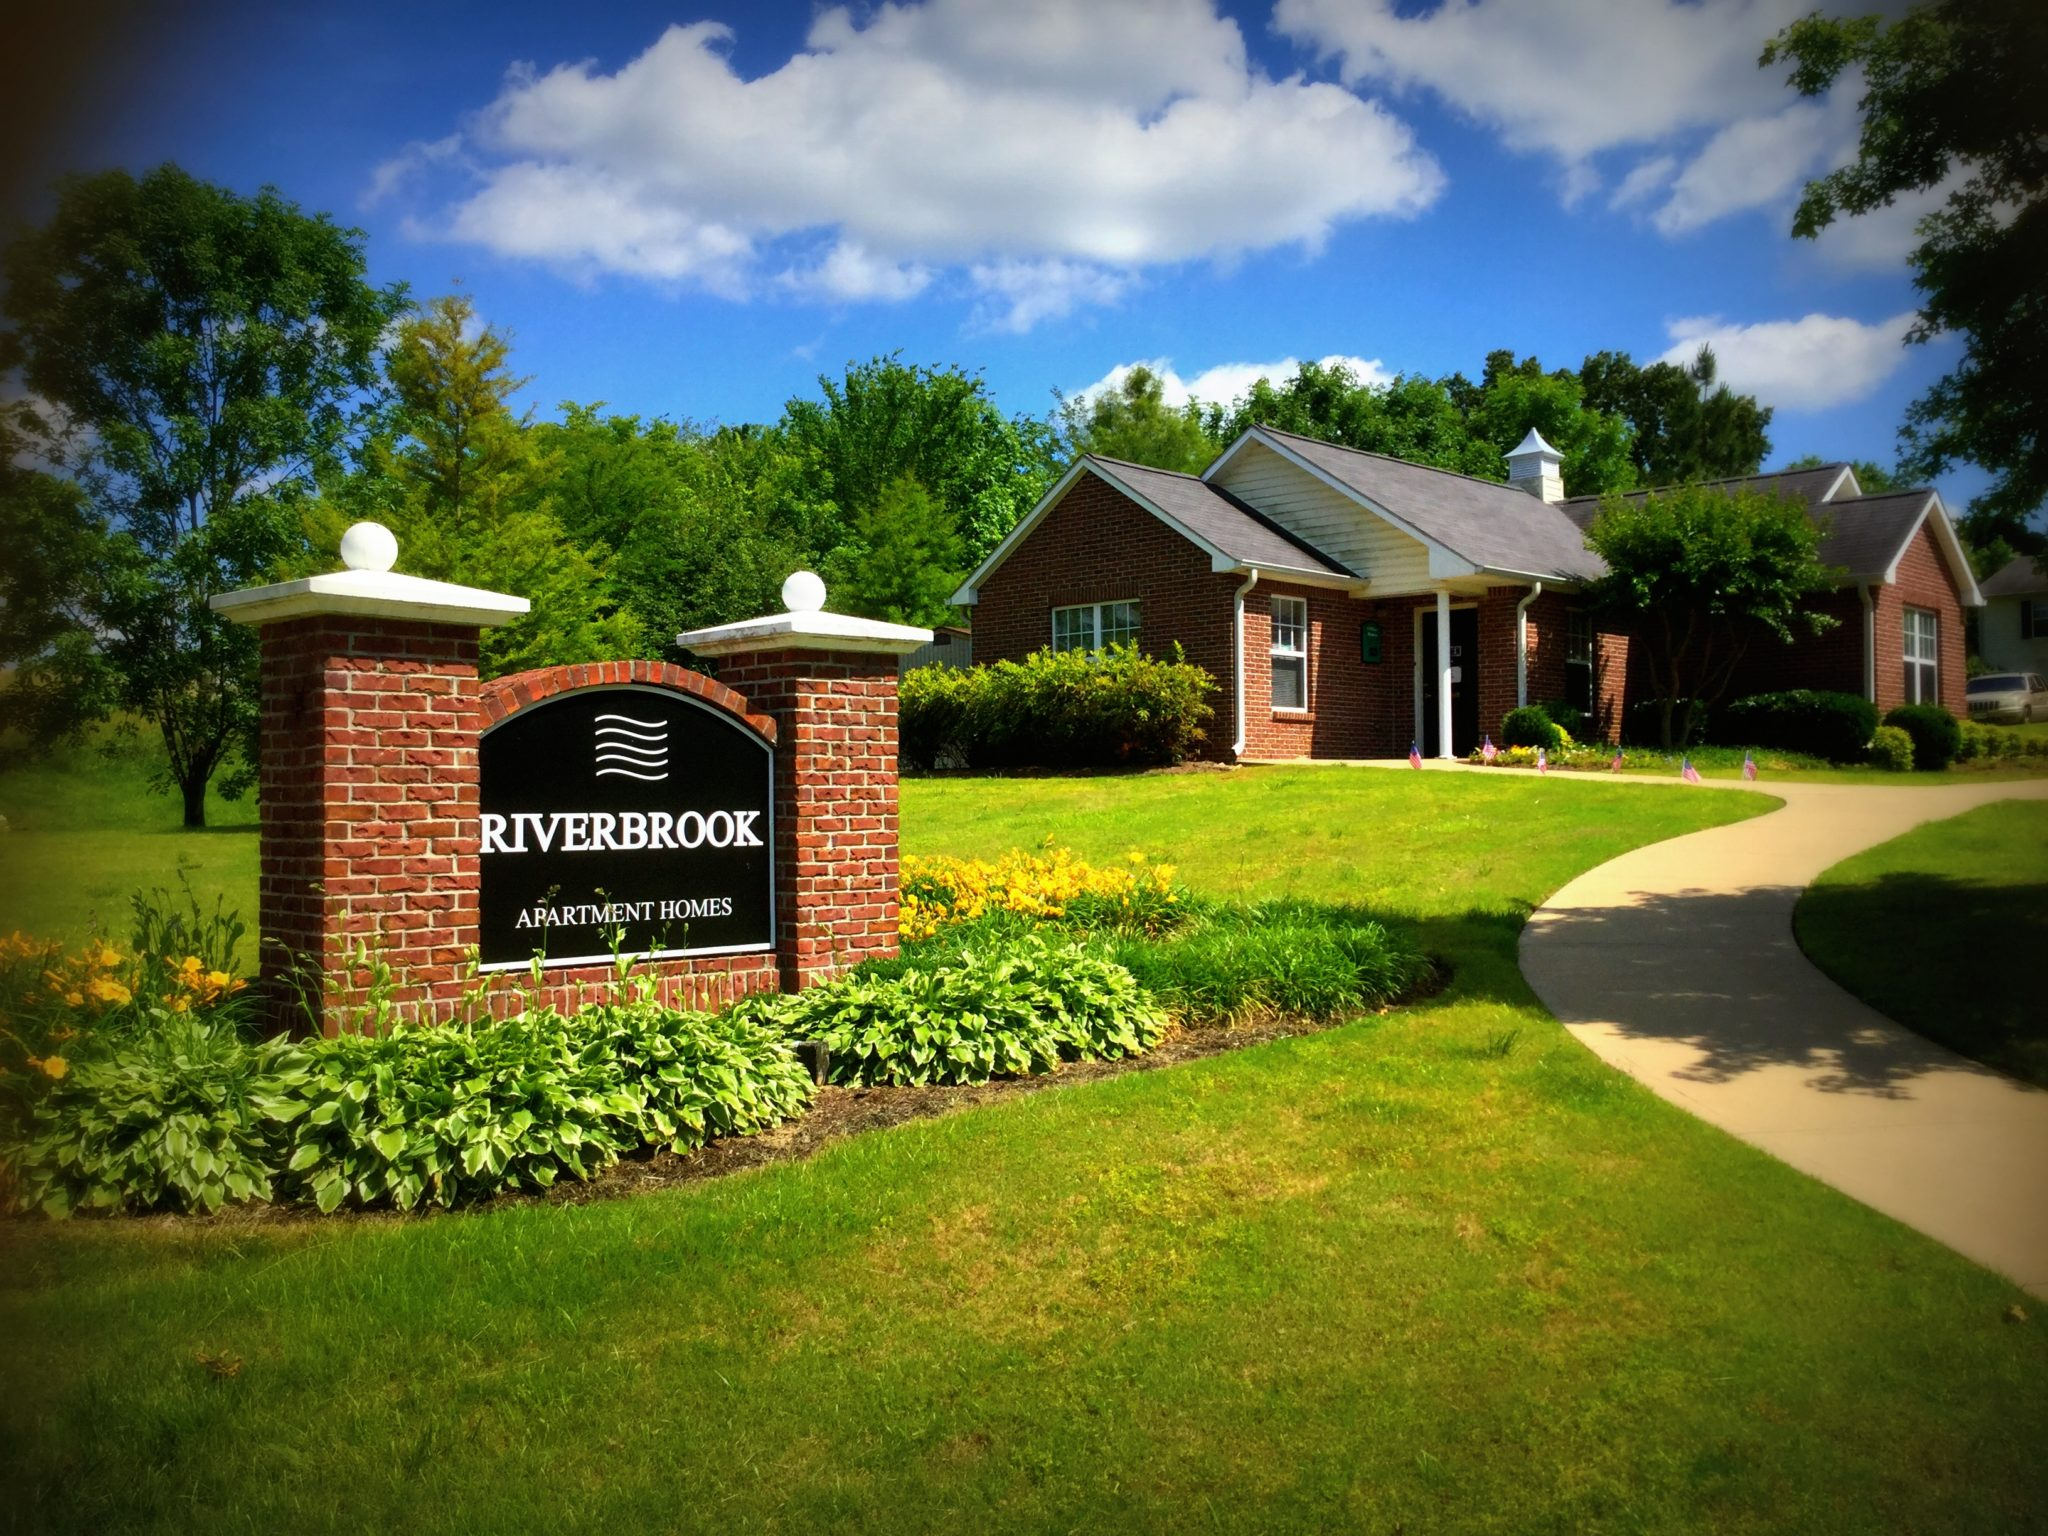 Riverbrook,Brownsville Tn entrance